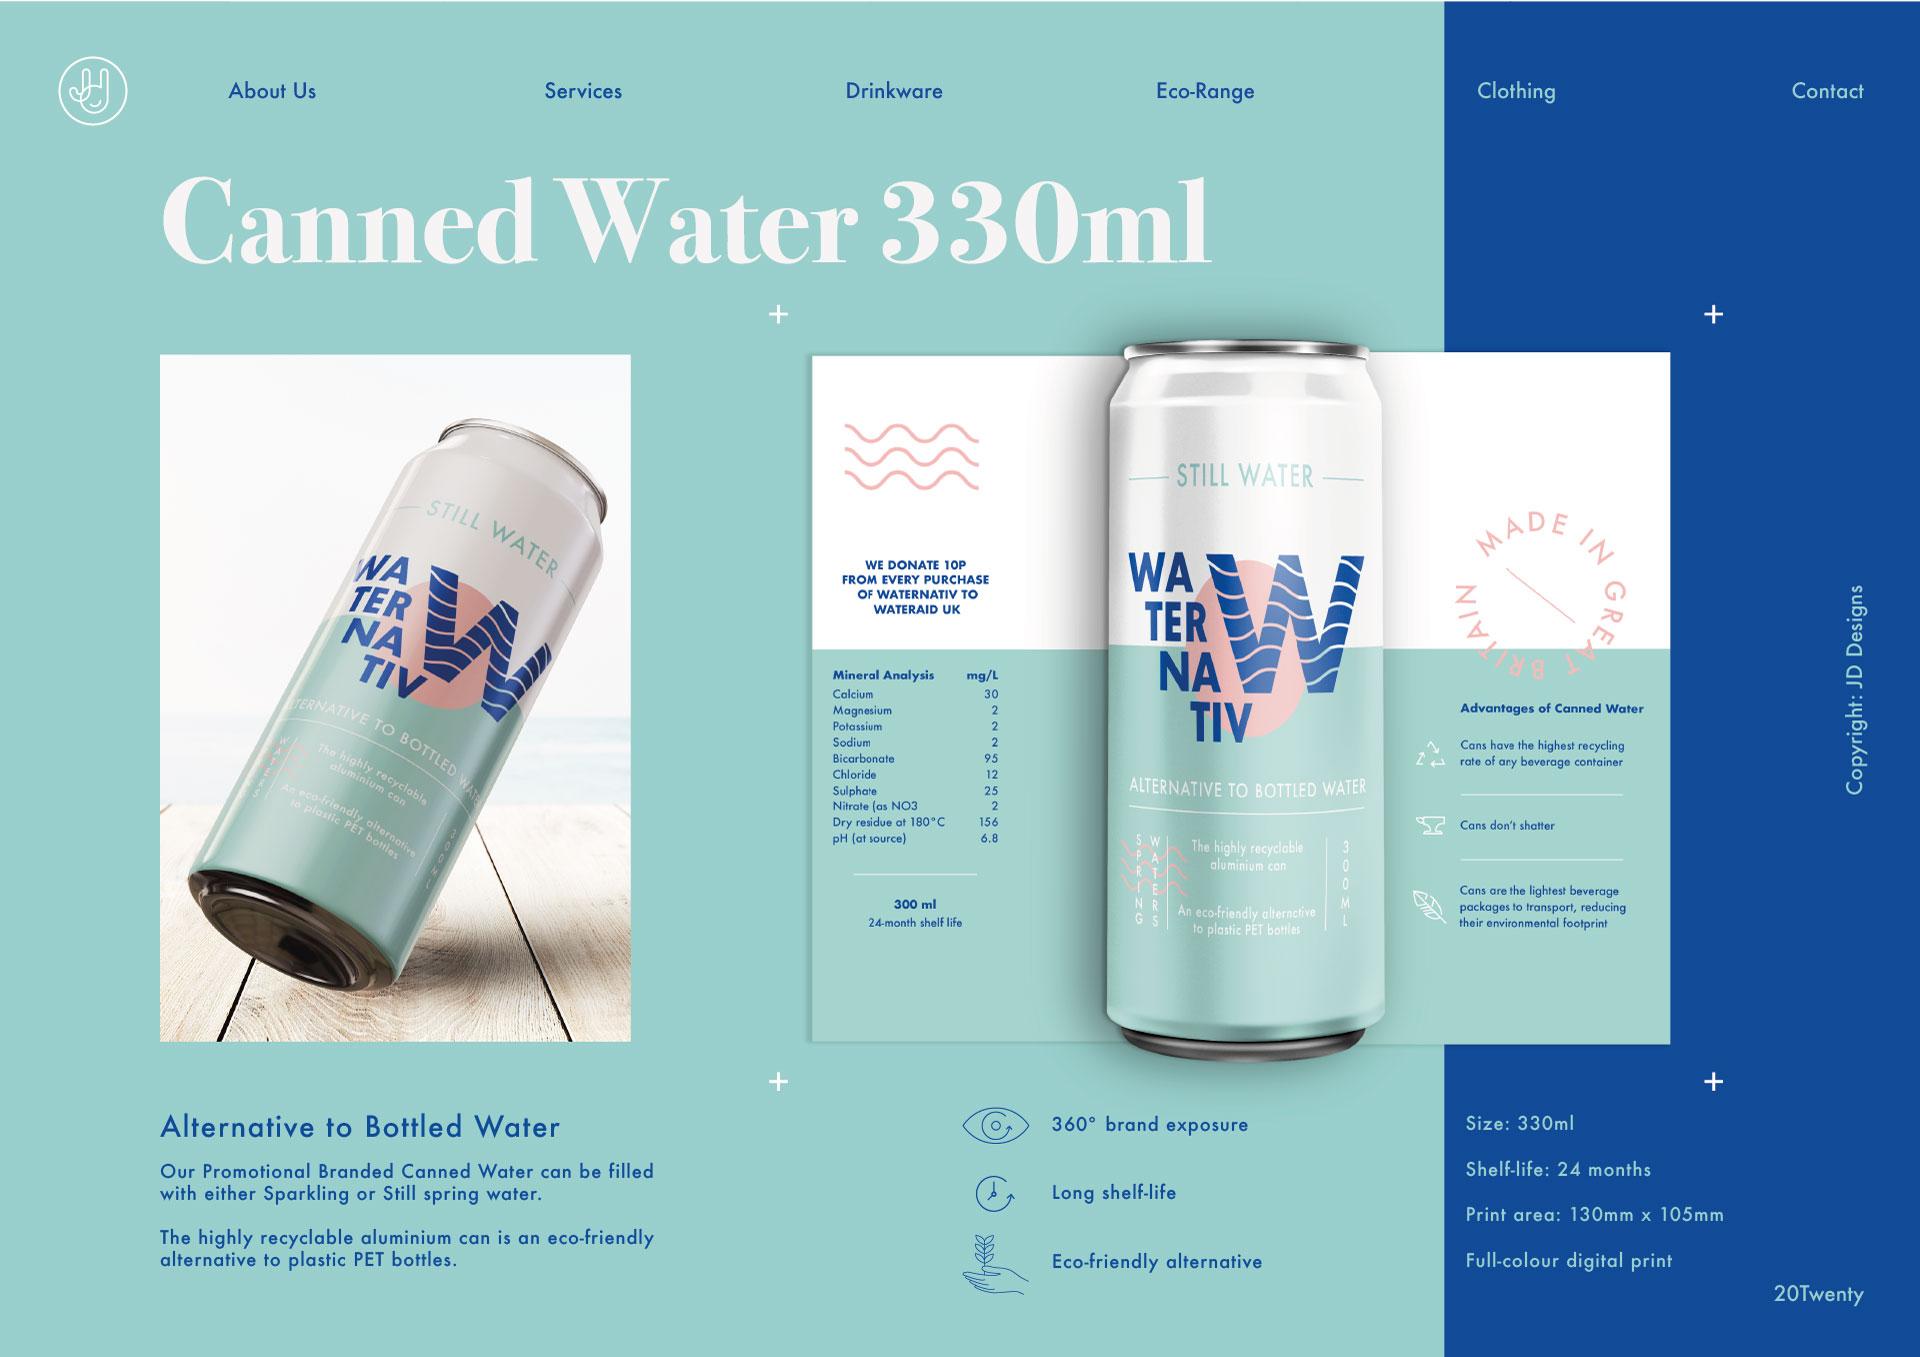 promotional-merchandise-presentation-design-thanks